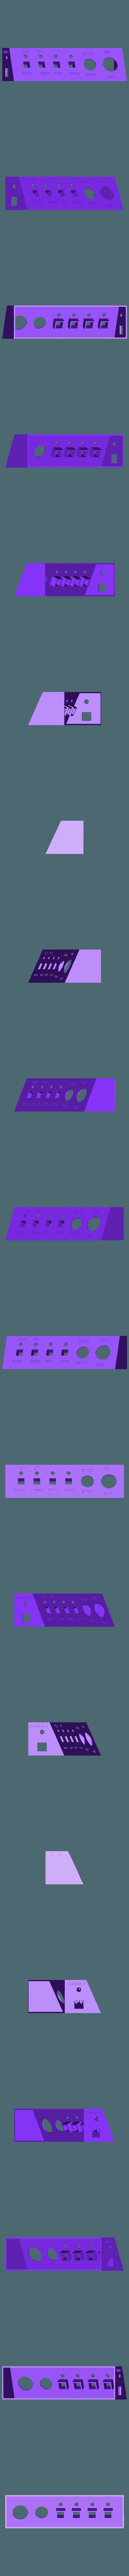 FRENTE.STL Download free GCODE file control panel for cnc grbl • 3D printable model, franhabas